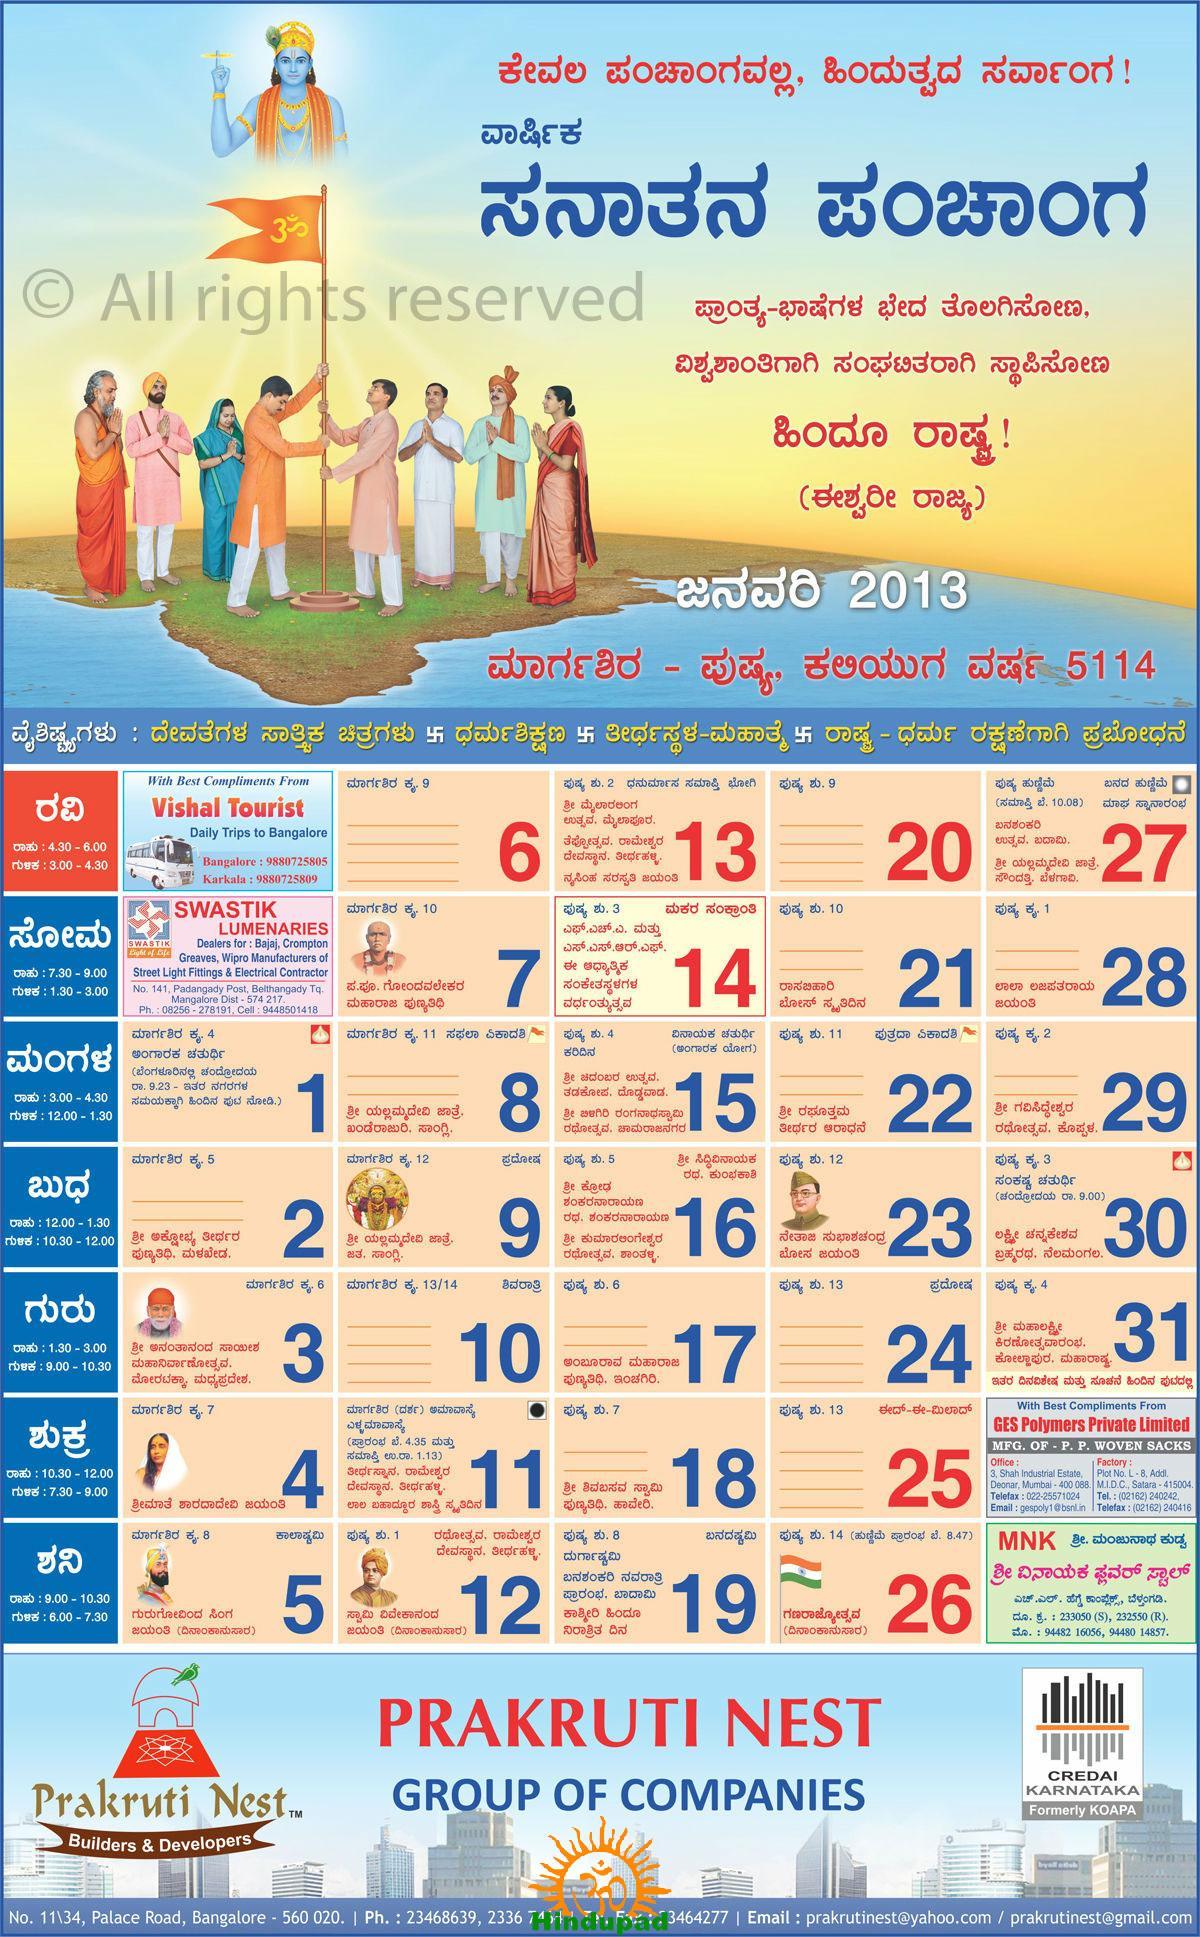 Kannada Sanatan Panchanga 2019 - HinduPad